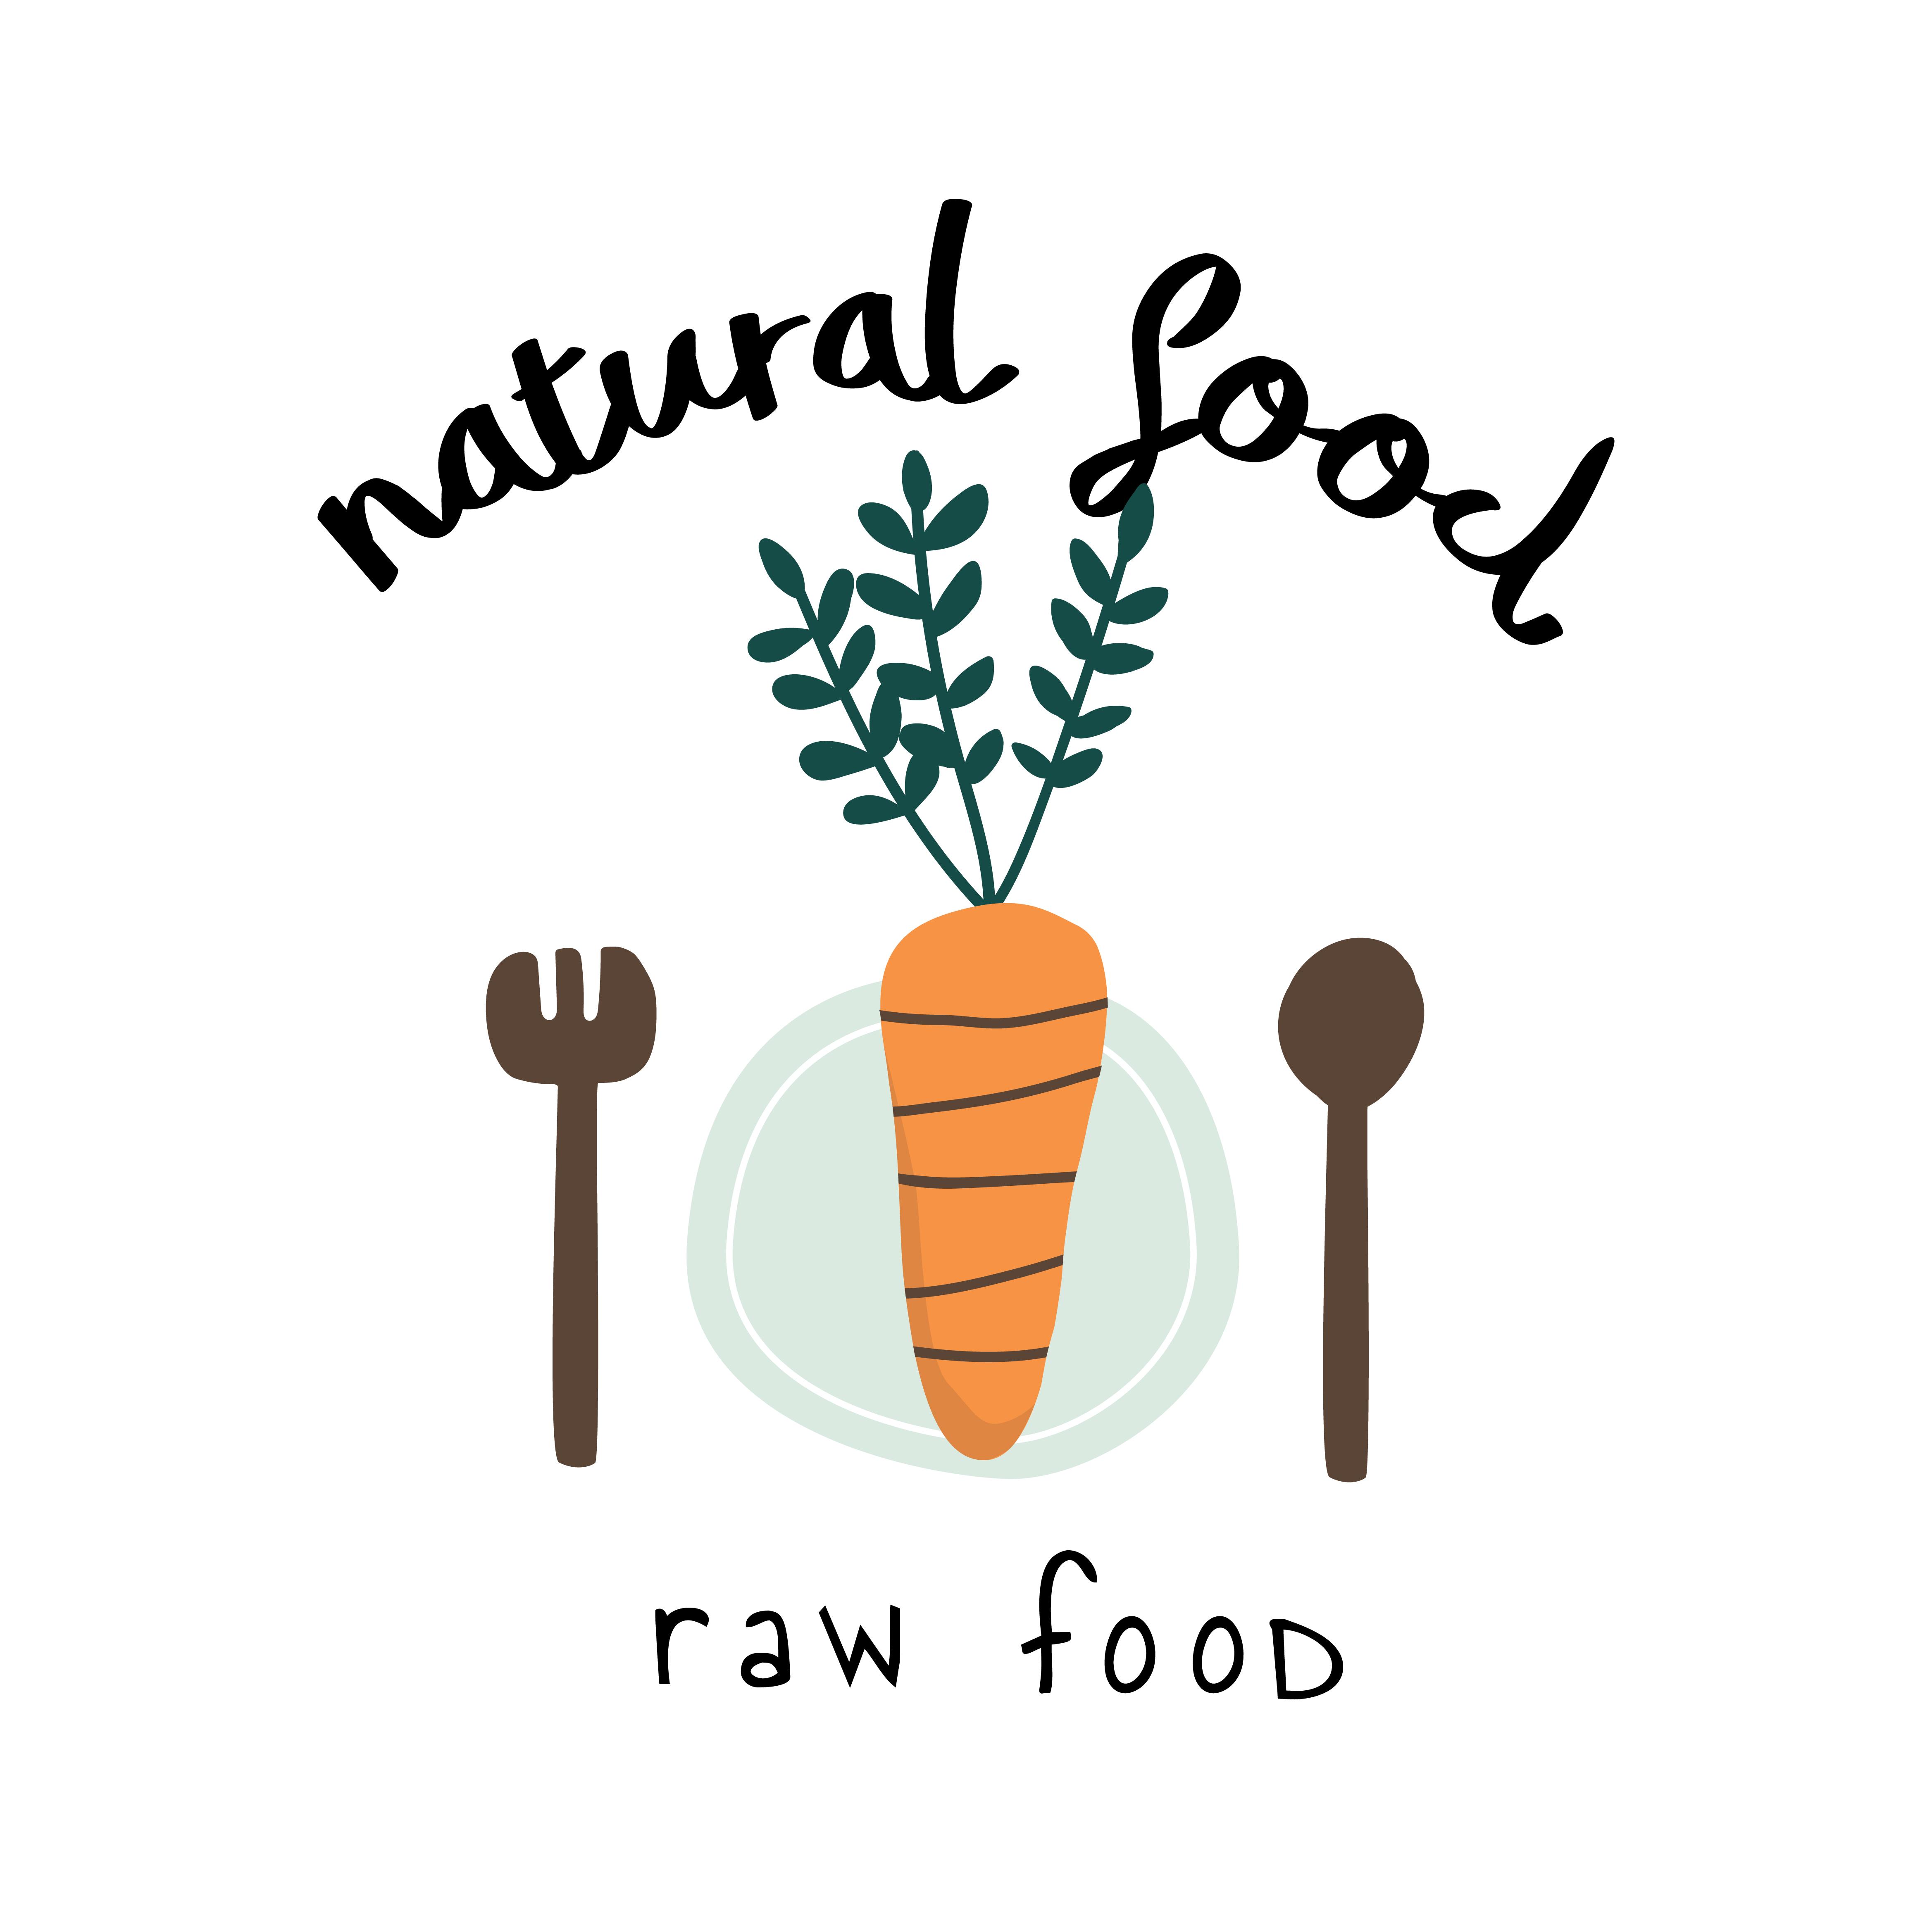 Natural raw food logo vector - Download Free Vectors ...